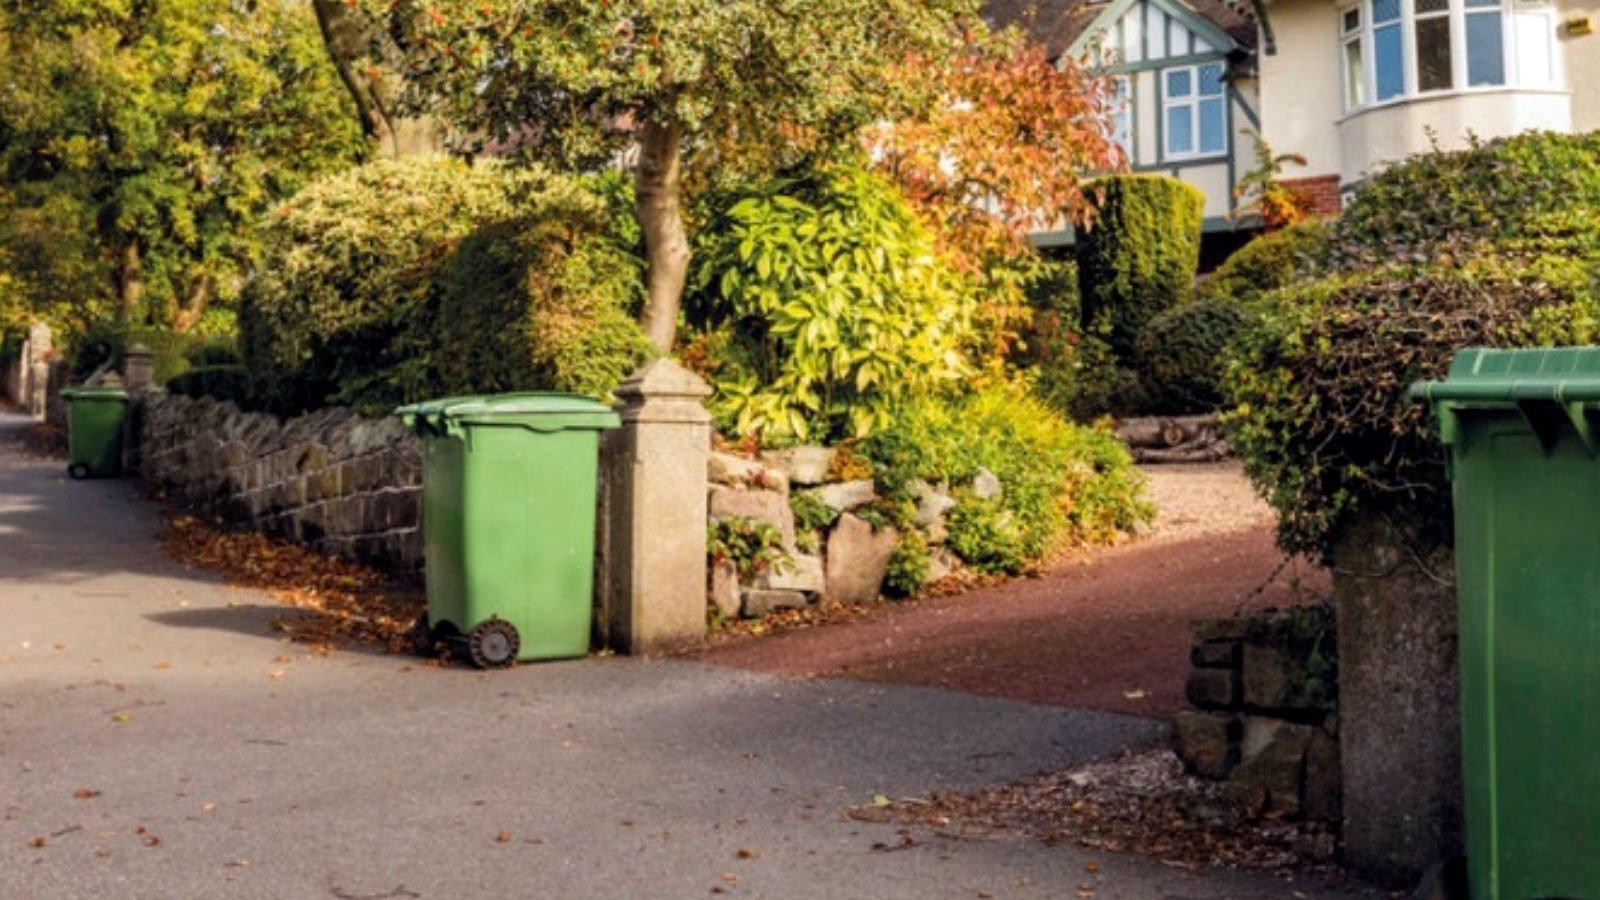 Green Bin Collections in Sheffield